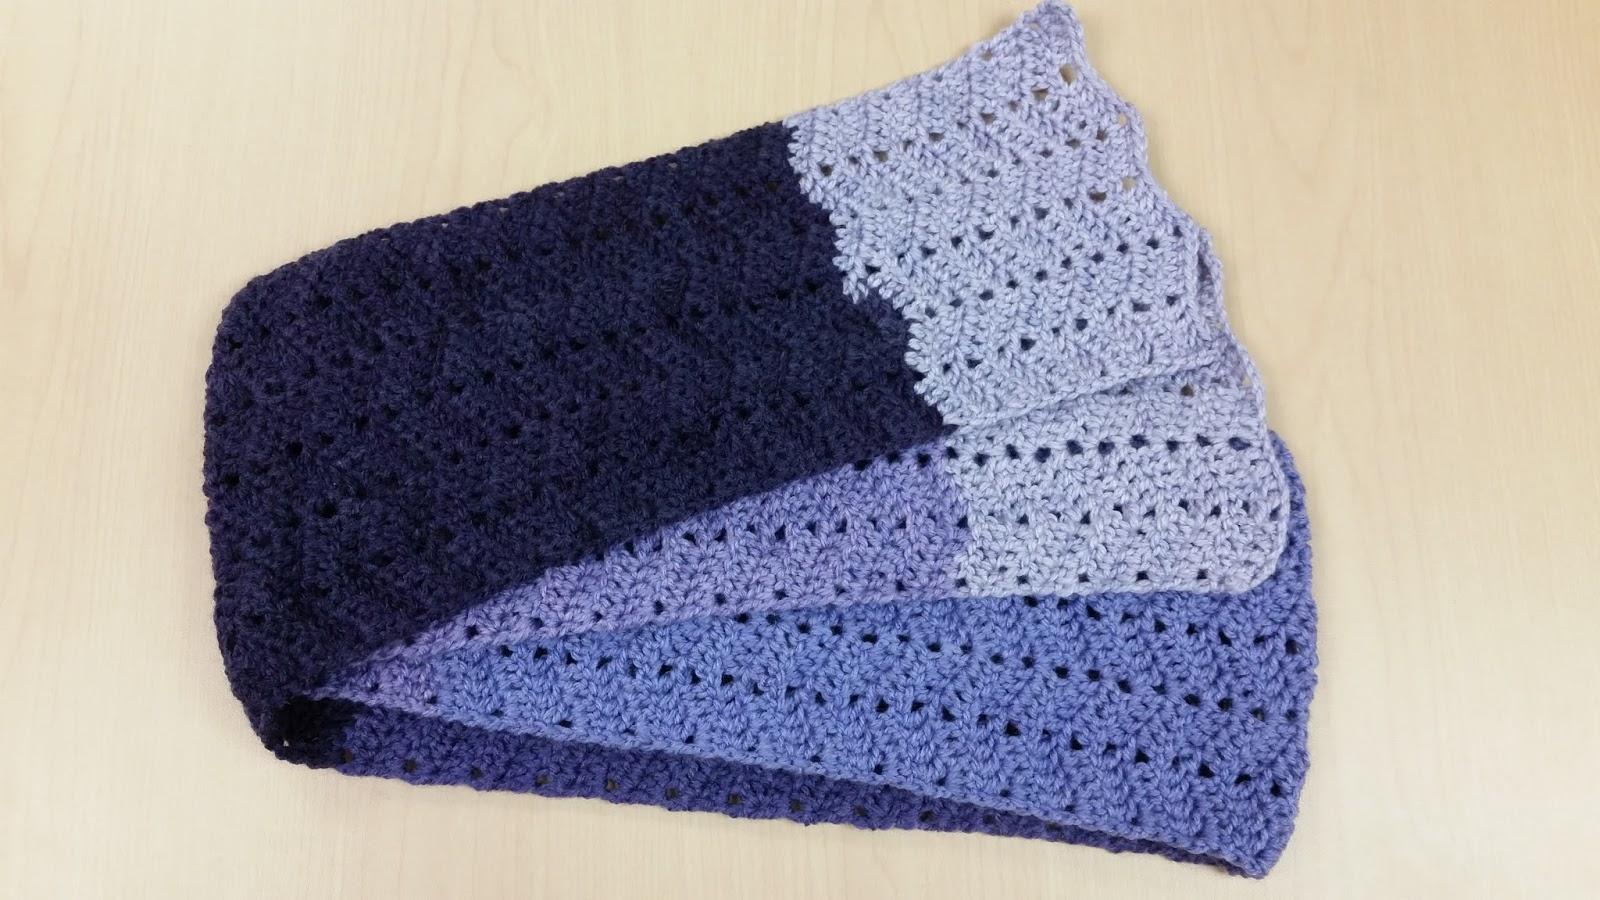 The Wandering Bunny: Crochet Wave Scarf - Rainy Day Crocheting